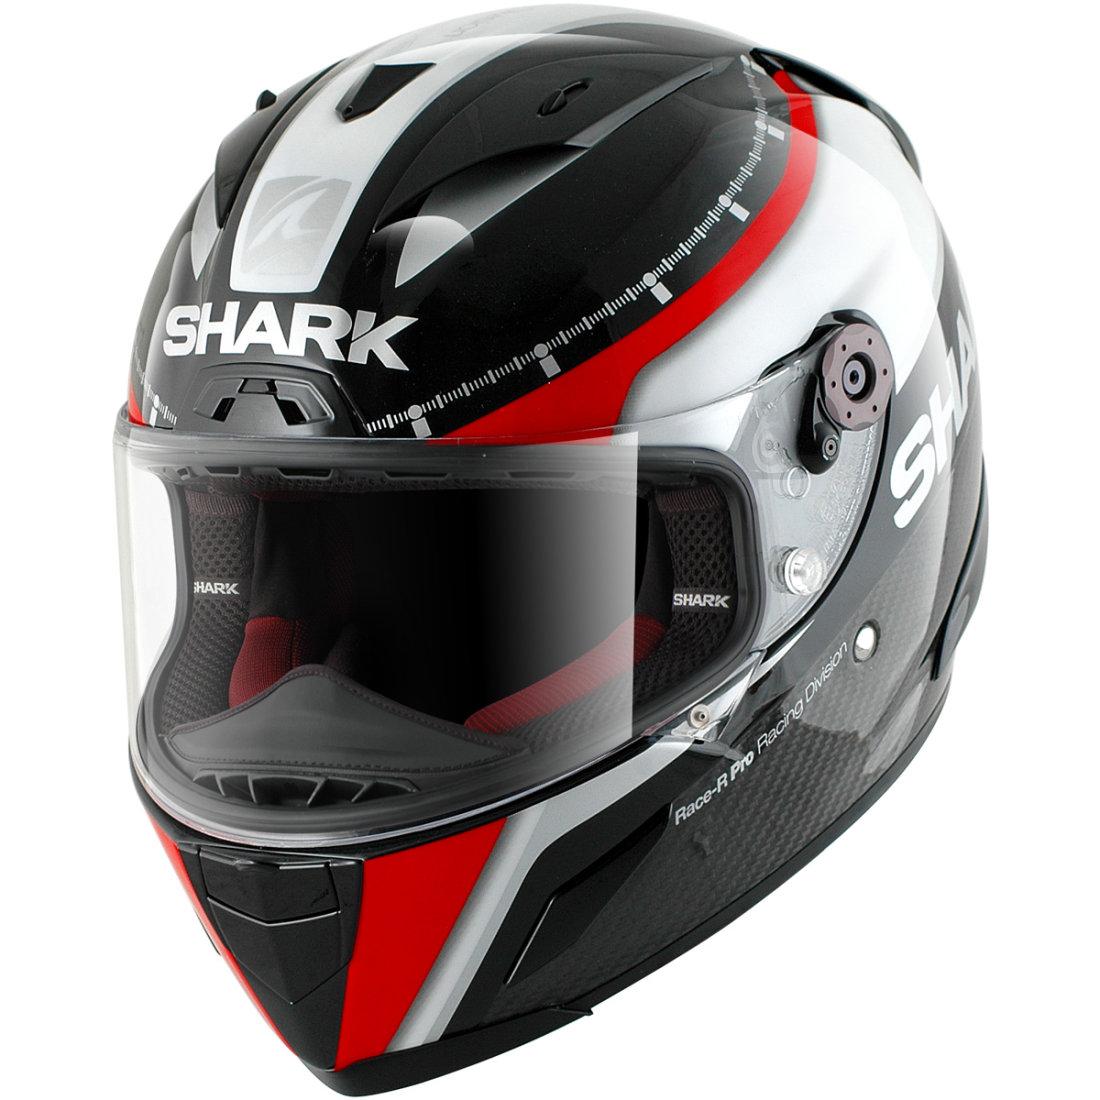 casco shark race r pro carbon racing division n bl r motocard. Black Bedroom Furniture Sets. Home Design Ideas